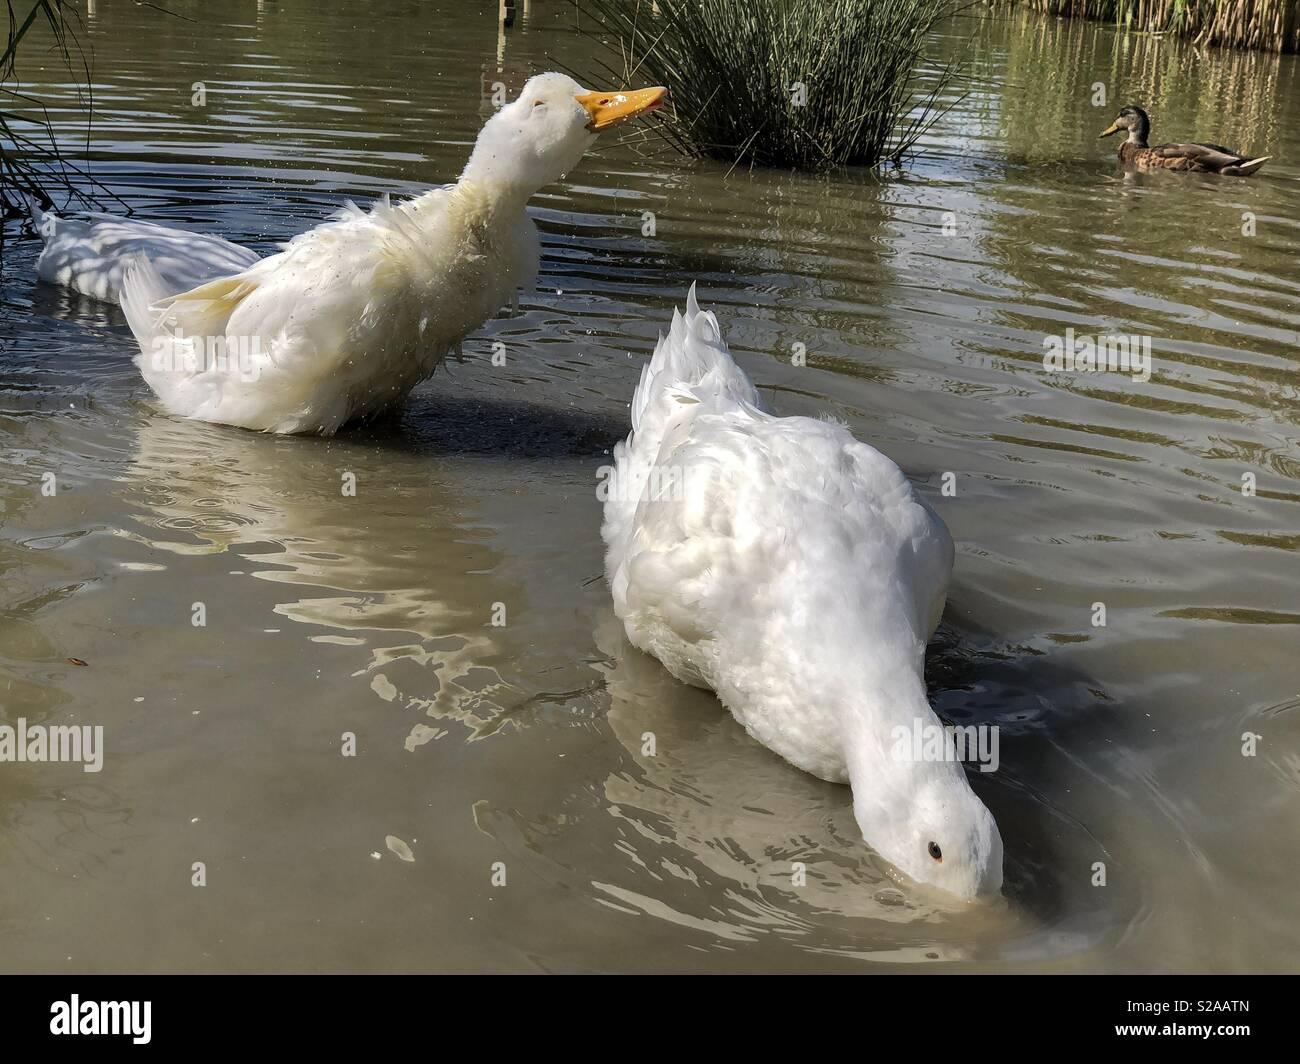 Pekin or Aylesbury heavy duck shaking water off her feathers - Stock Image